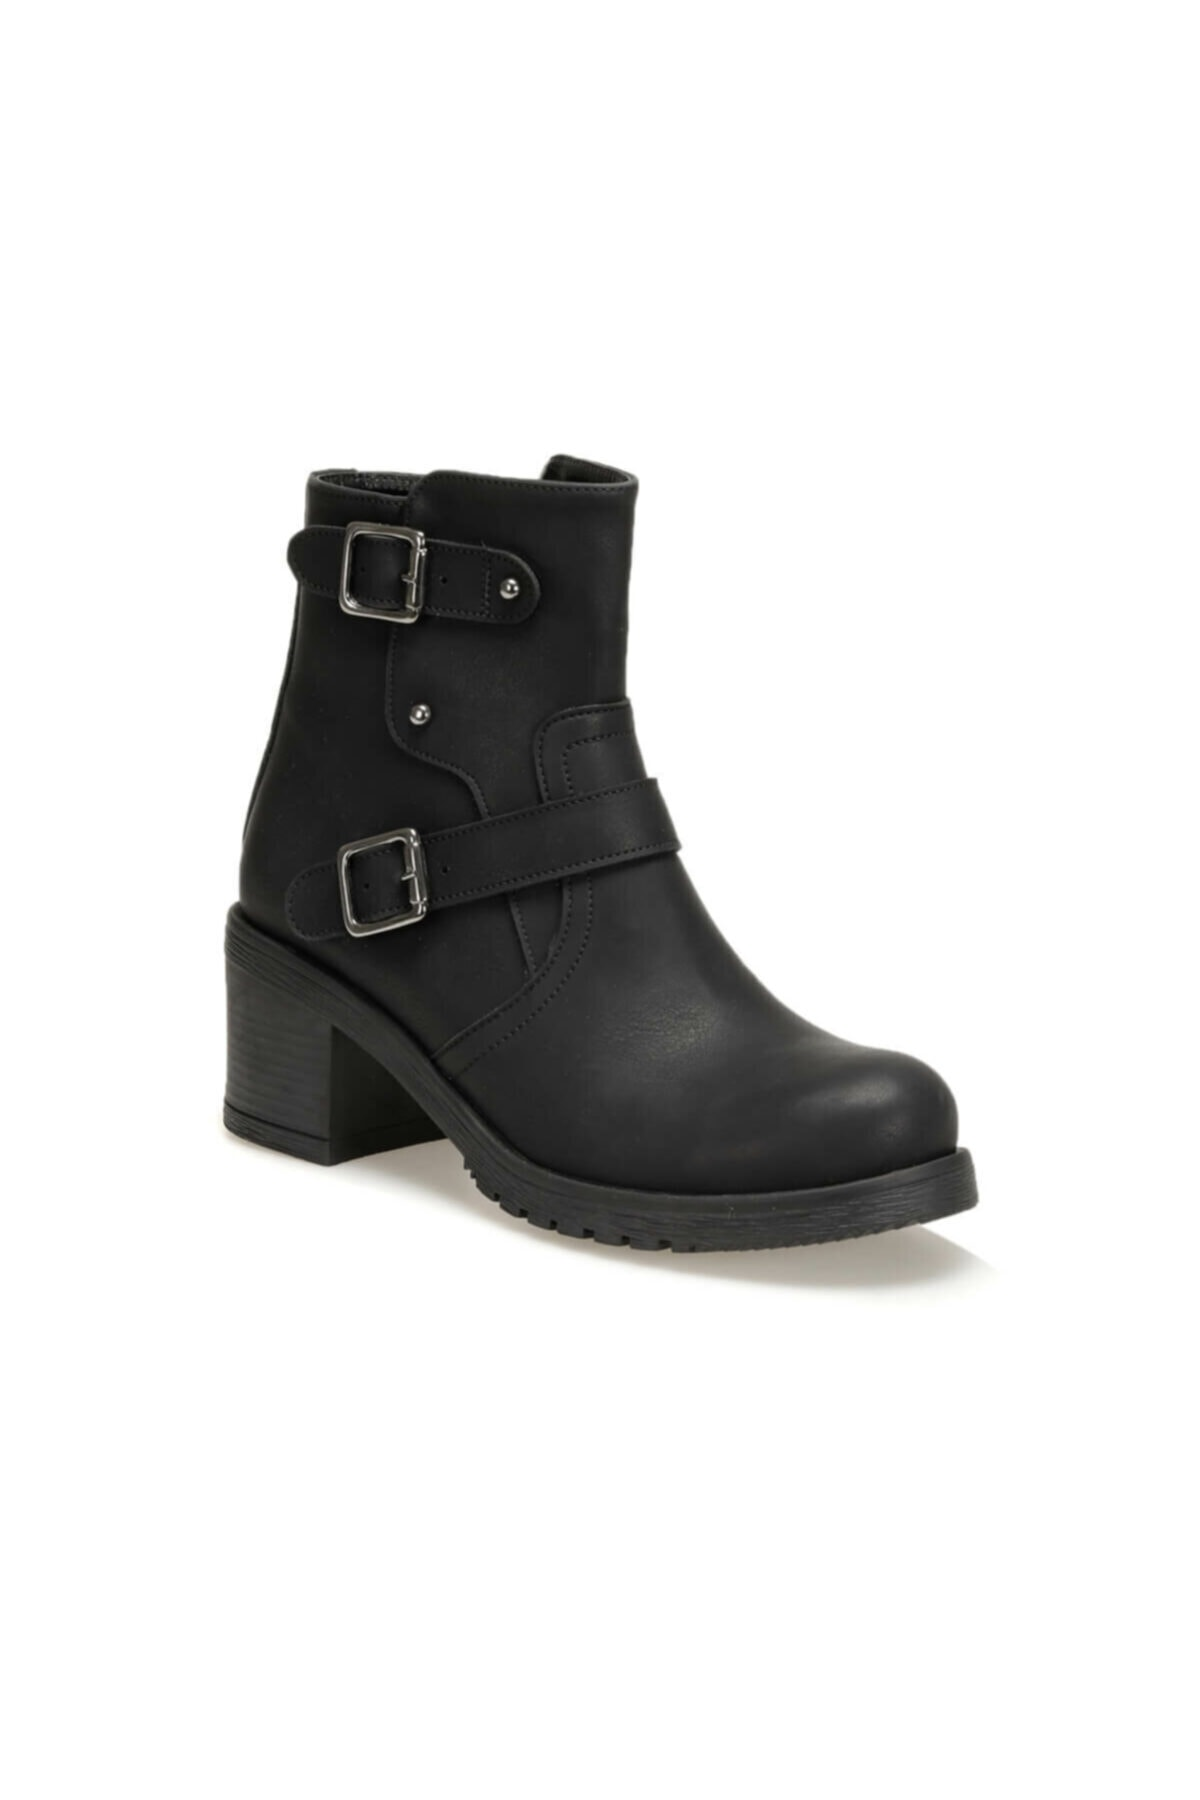 CW19032 Siyah Kadın Topuklu Ayakkabı 100440352